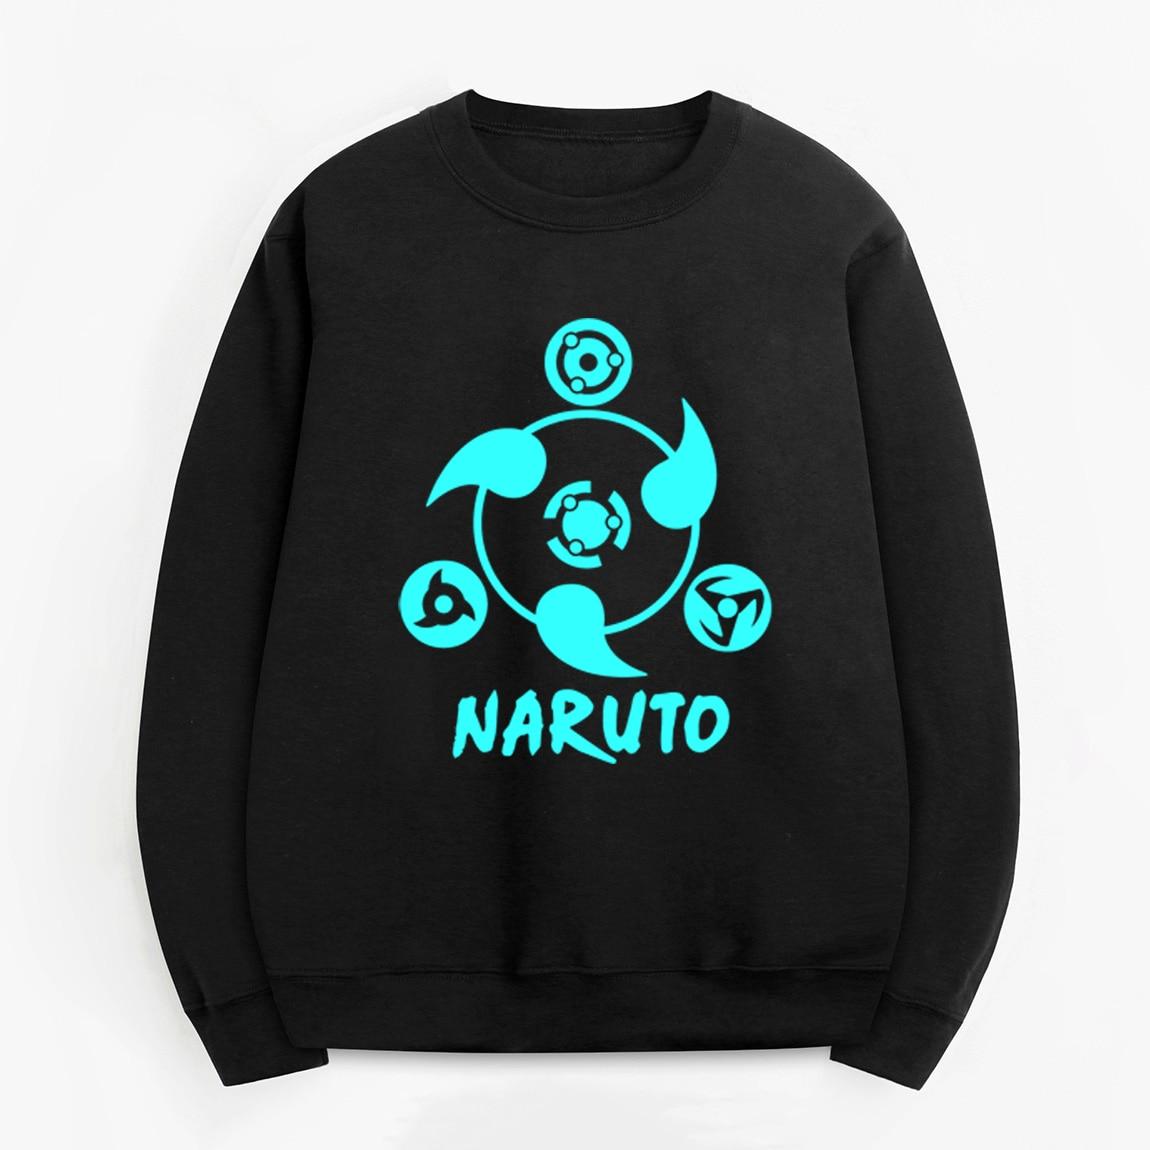 2019 man casual fleece bodybuilding pullovers Uzumaki Naruto hoodies men Anime noctilucous print fashion sweatshirts tracksuits